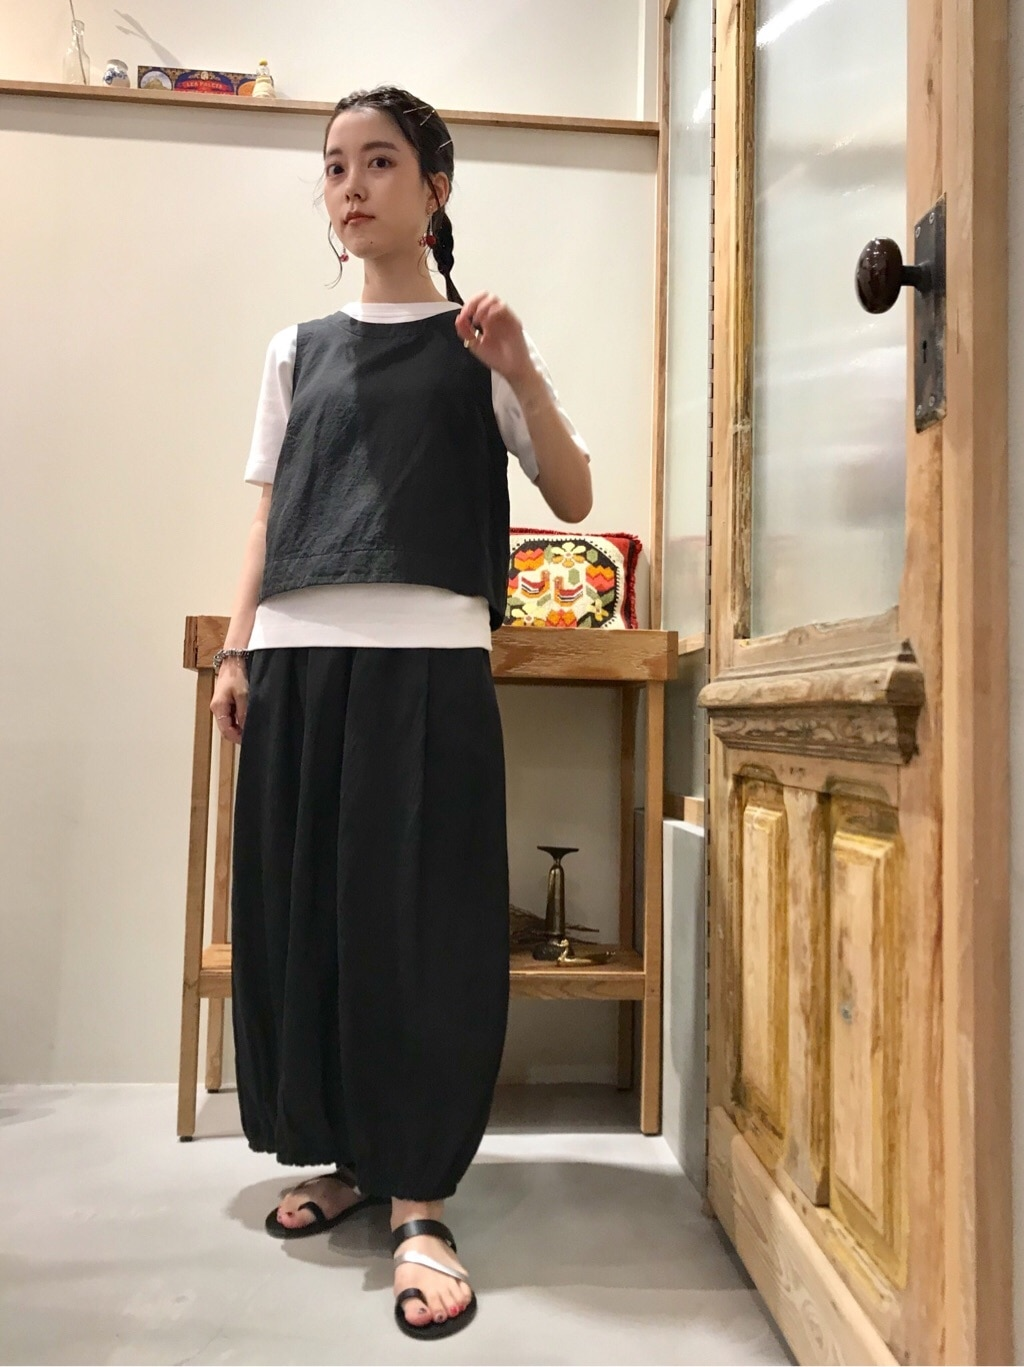 bulle de savon 渋谷スクランブルスクエア 身長:153cm 2020.07.10